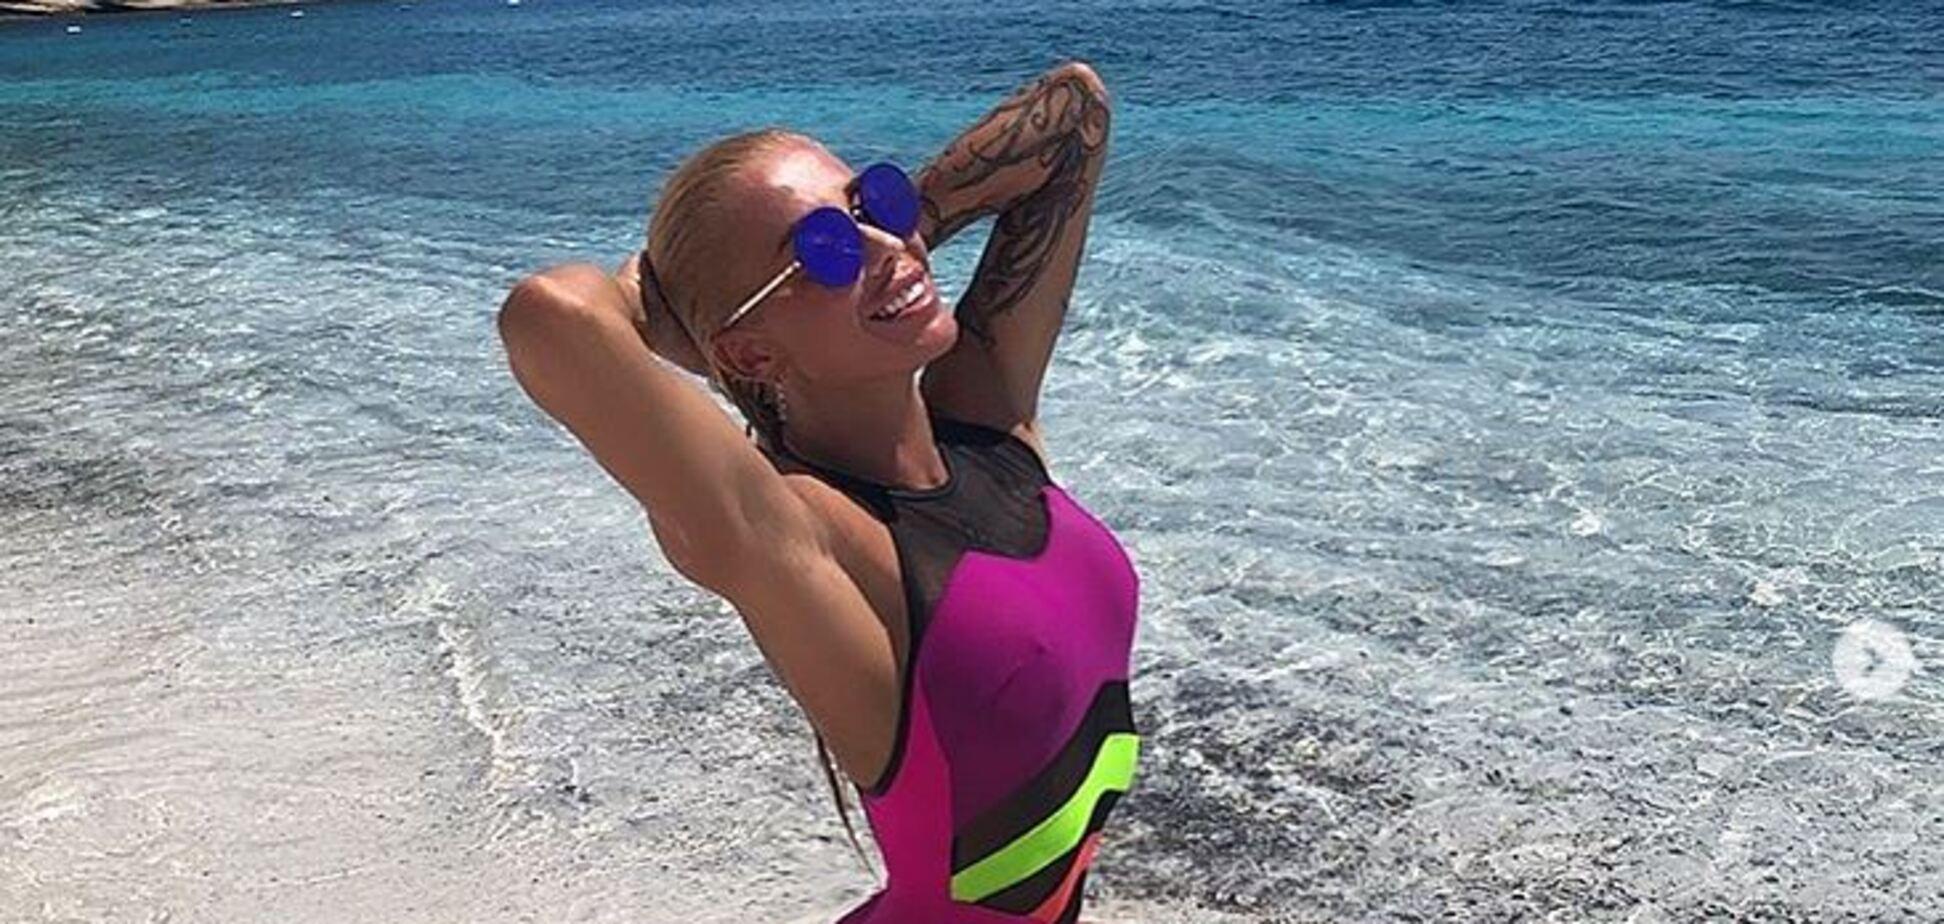 Українська ведуча похвалилася сексуальною фігурою в купальнику